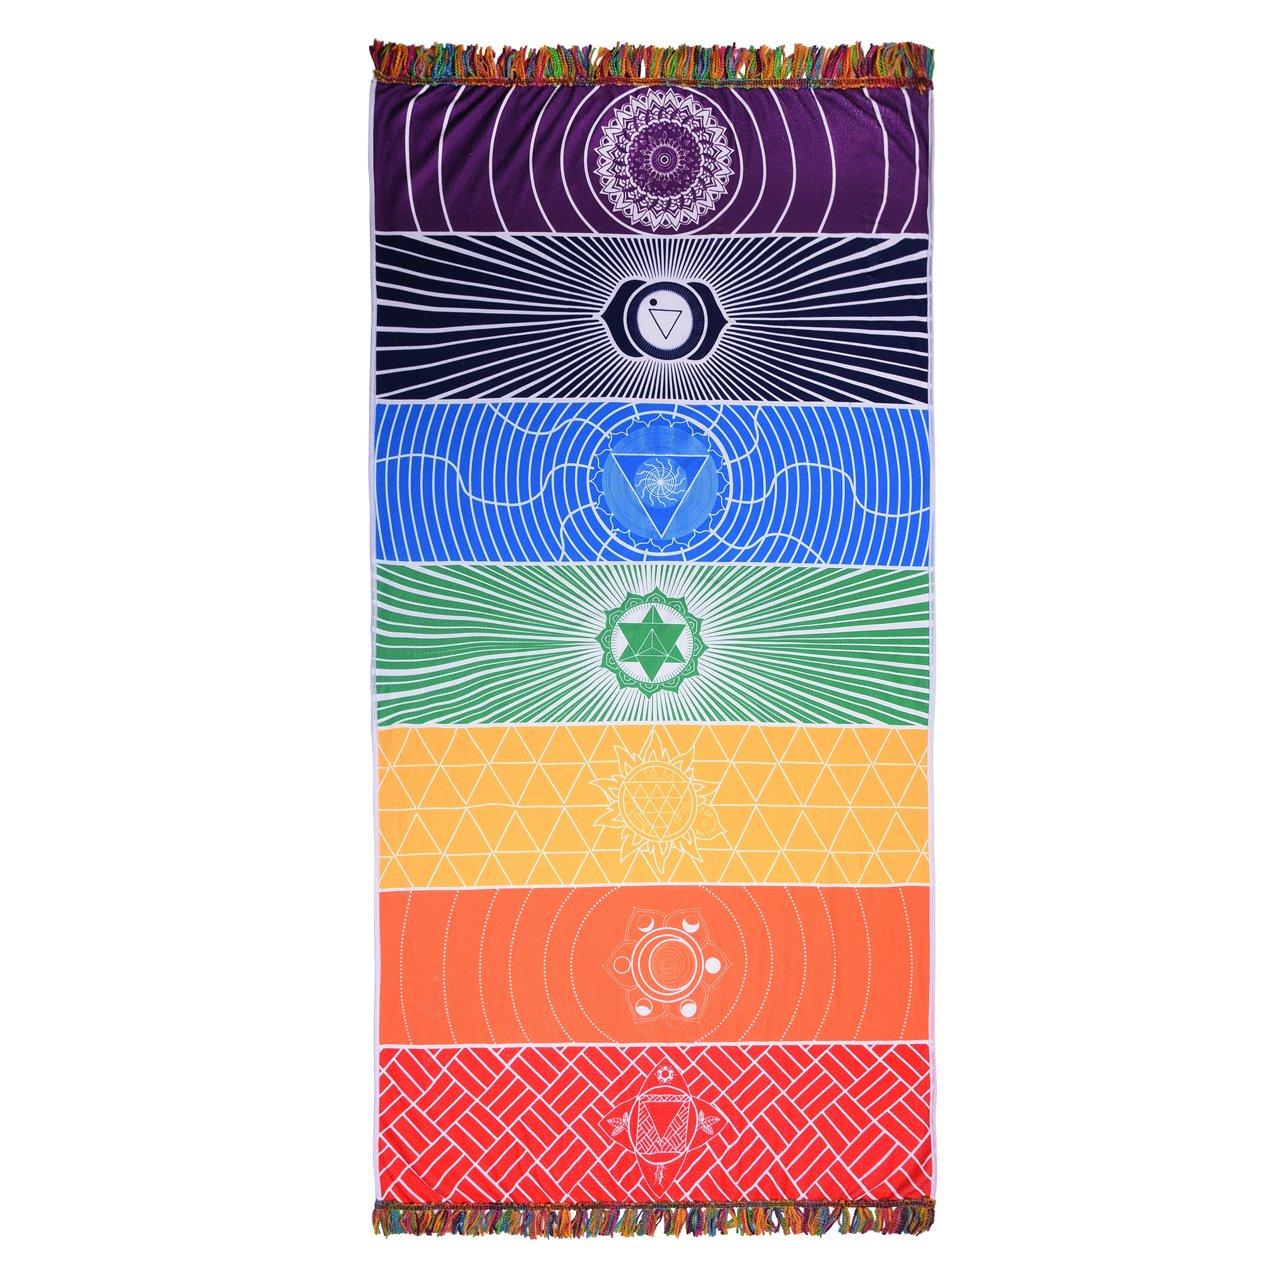 JOVIVI Rainbow 7 Chakra Print Meditation Mandara Yoga Mat Beach Bath Towel Picnic Blanket Tapestry Bedroom Carpet,75X150cm